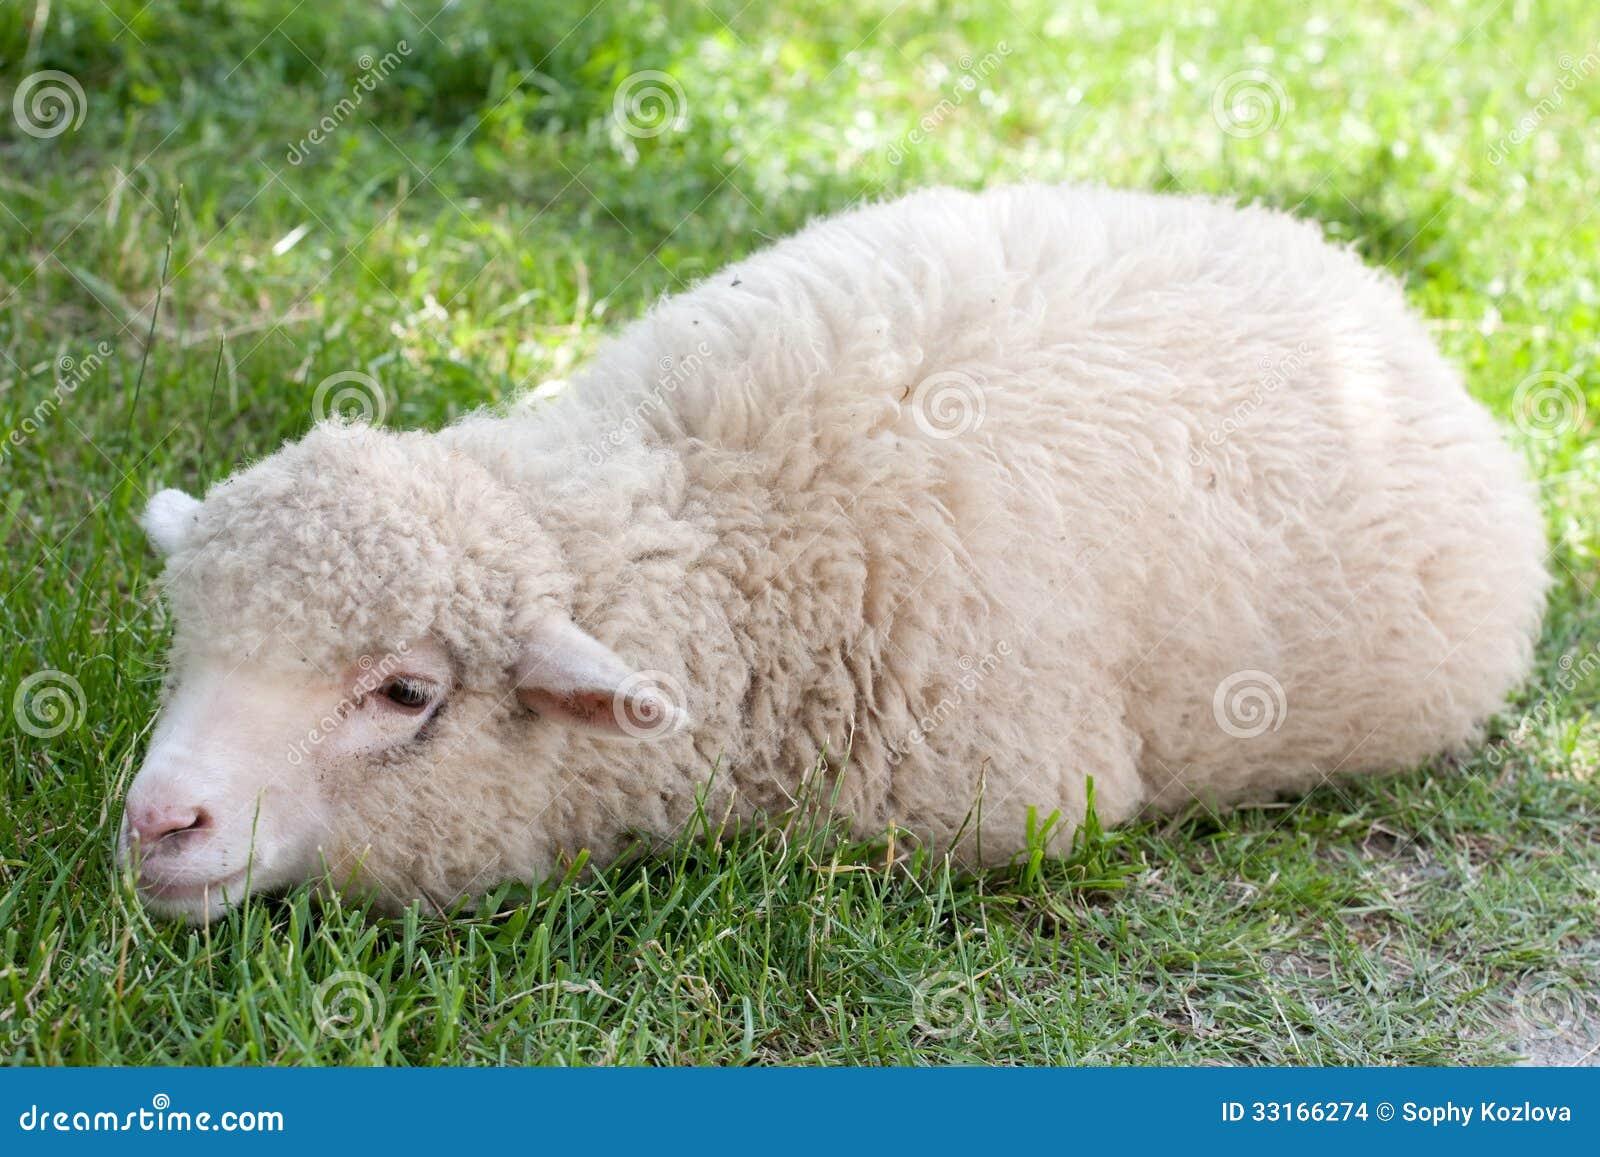 White sheep - photo#6